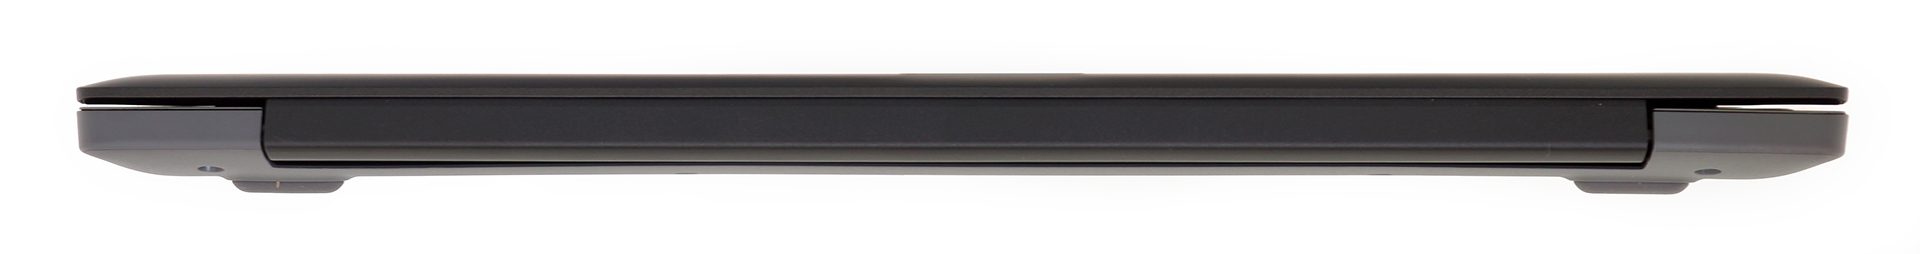 Lenovo Ideapad 320 (Core i5-7200U, GeForce 940MX) review – good